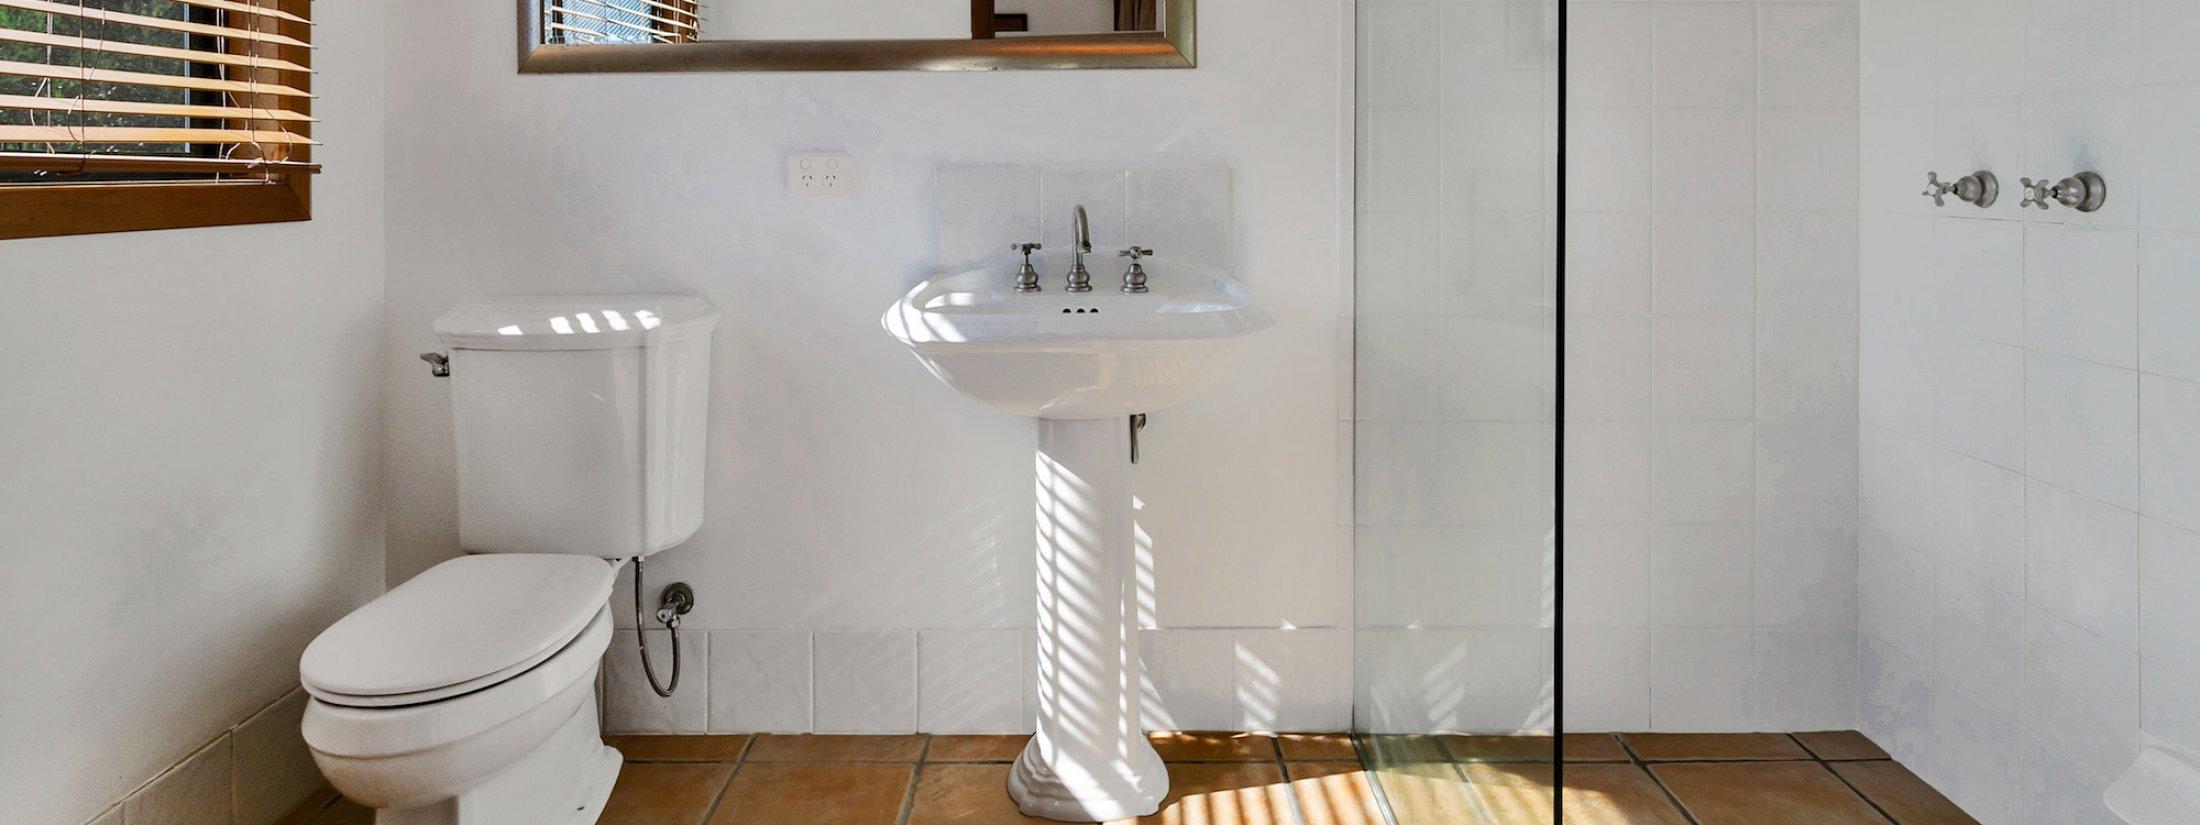 Jannah - Lennox Head - Master Bedroom ensuite bathroom